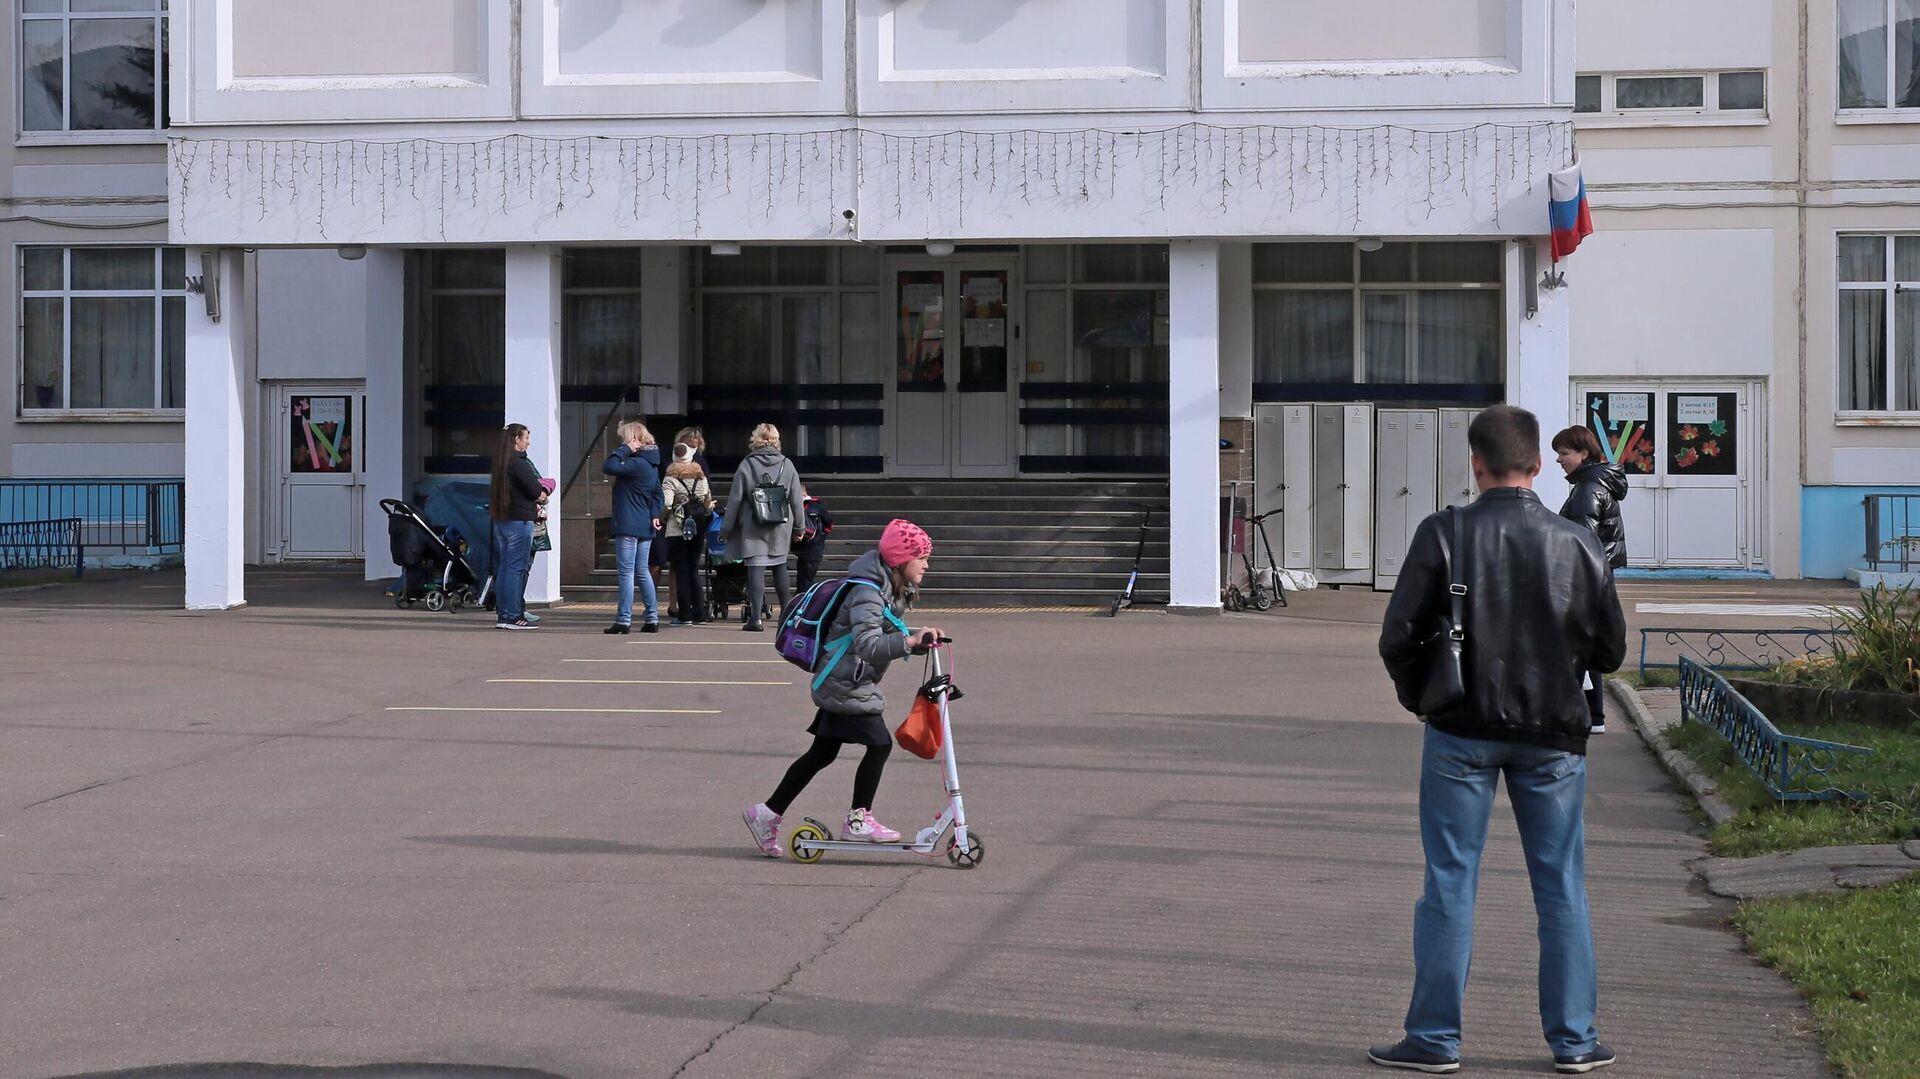 Ученики с родителями на территории школы - РИА Новости, 1920, 01.06.2021